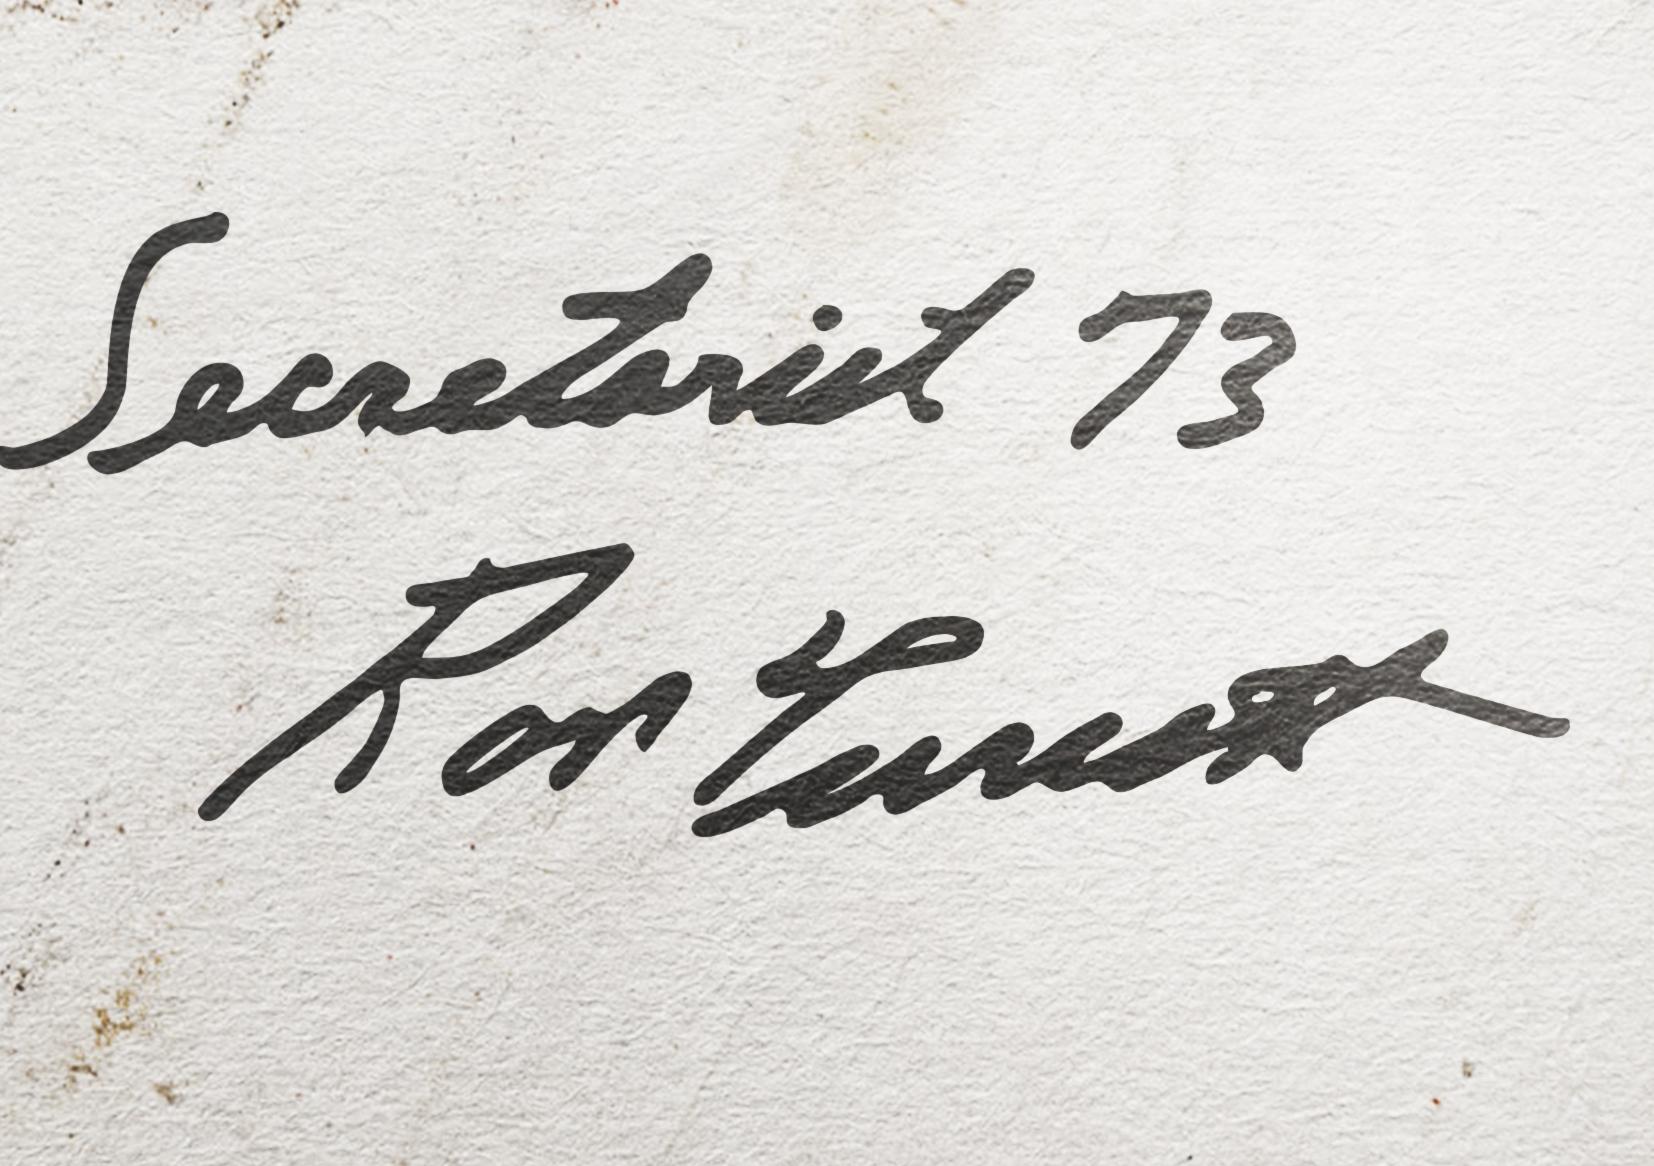 Autograph of jockey for Secretariat from 1973